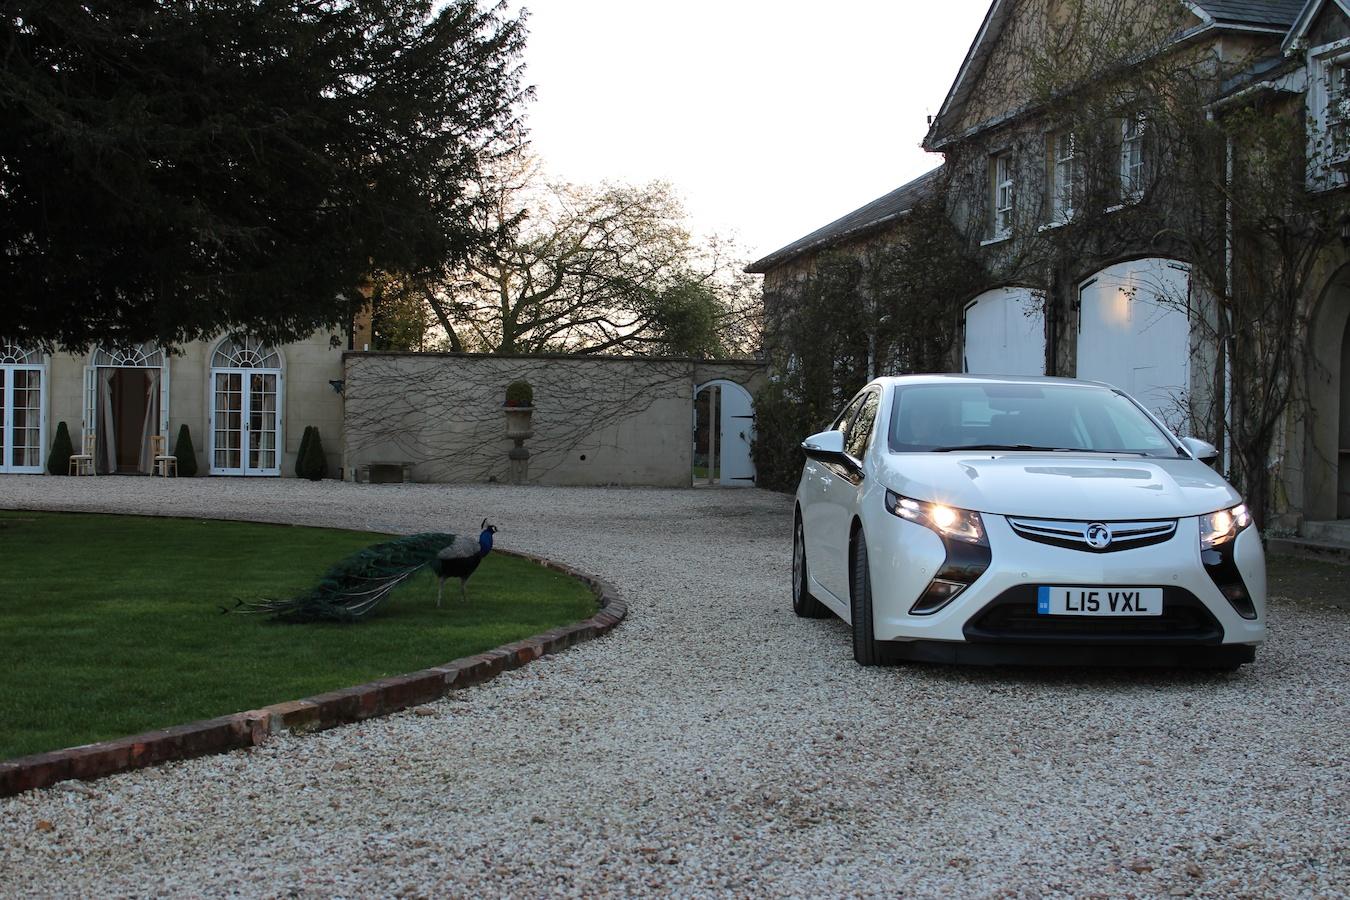 2012 Chevrolet Volt Vauxhall Ampera Drives From U K To France